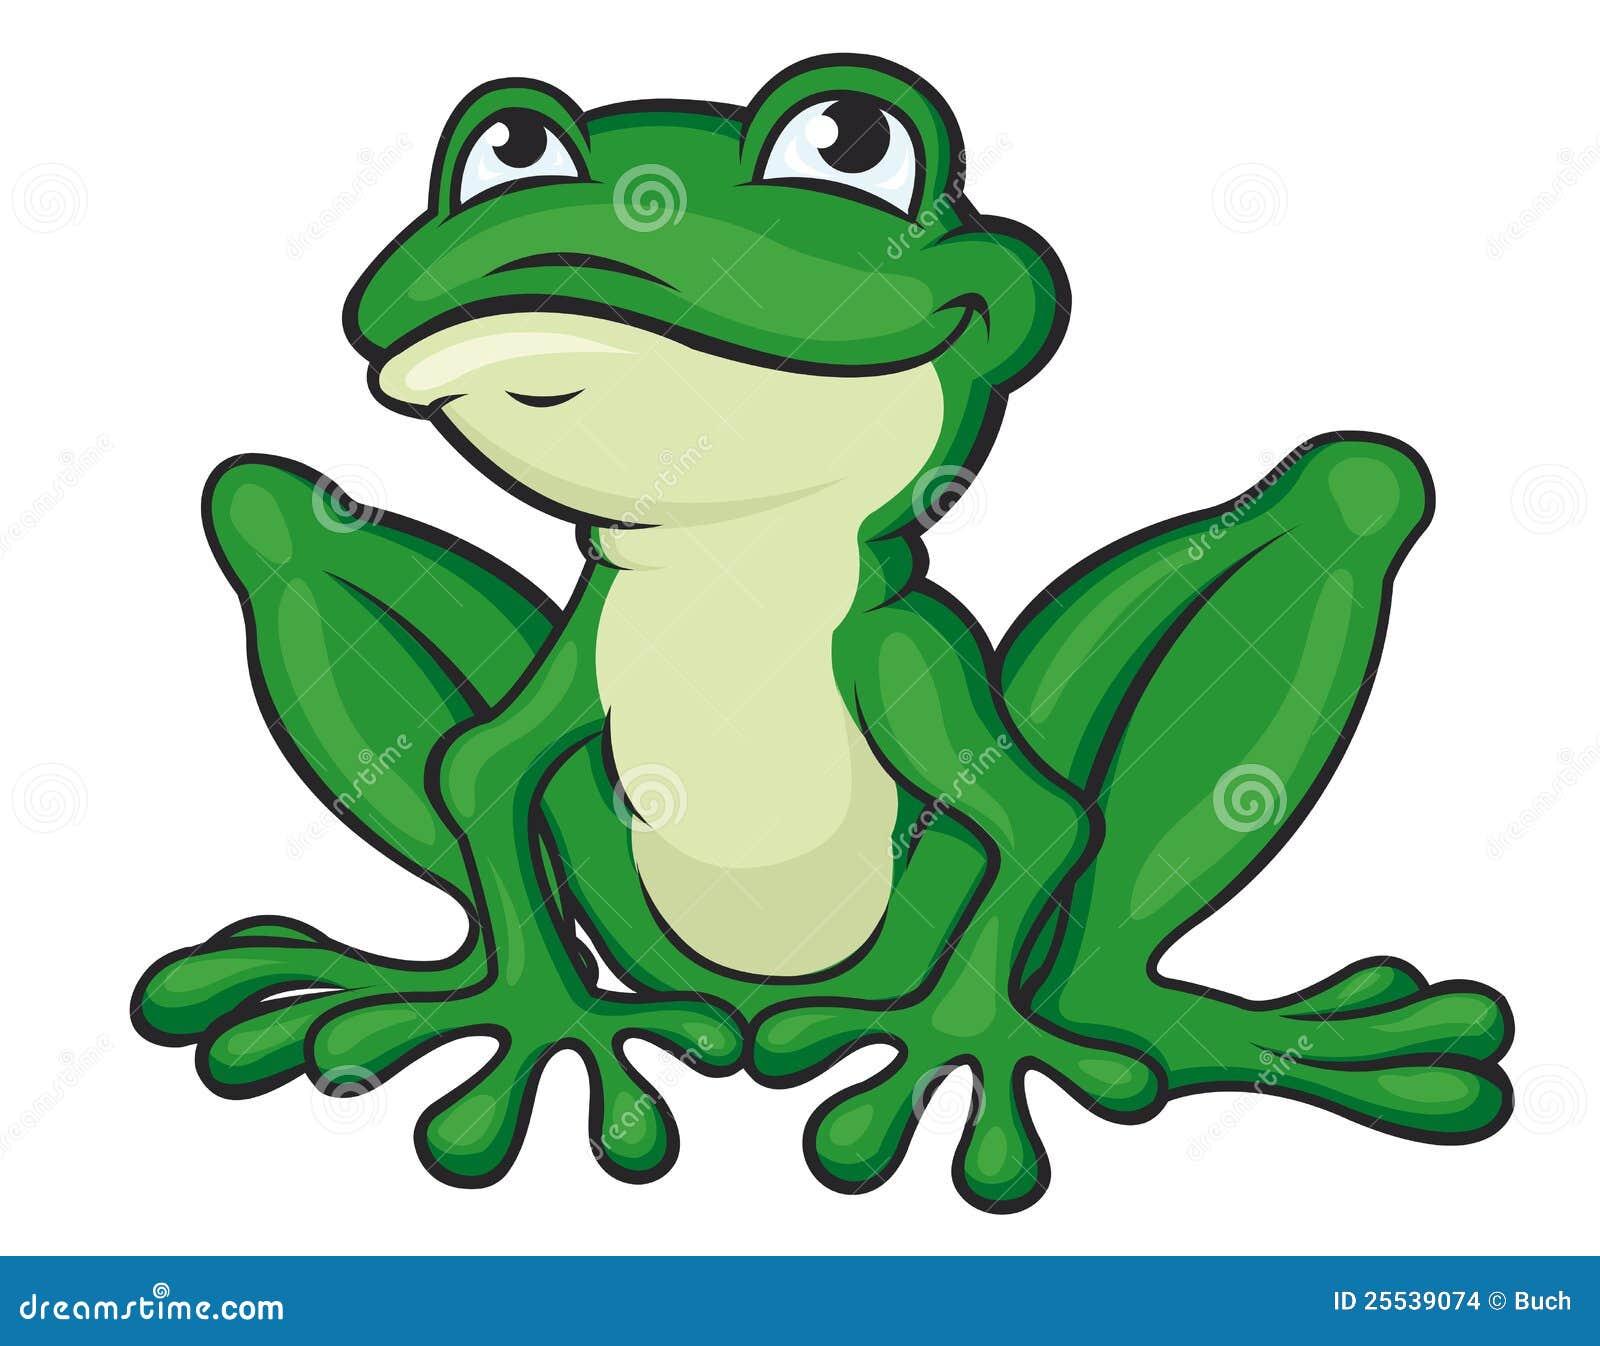 Grenouille verte de dessin anim images stock image 25539074 - Dessin de grenouille verte ...